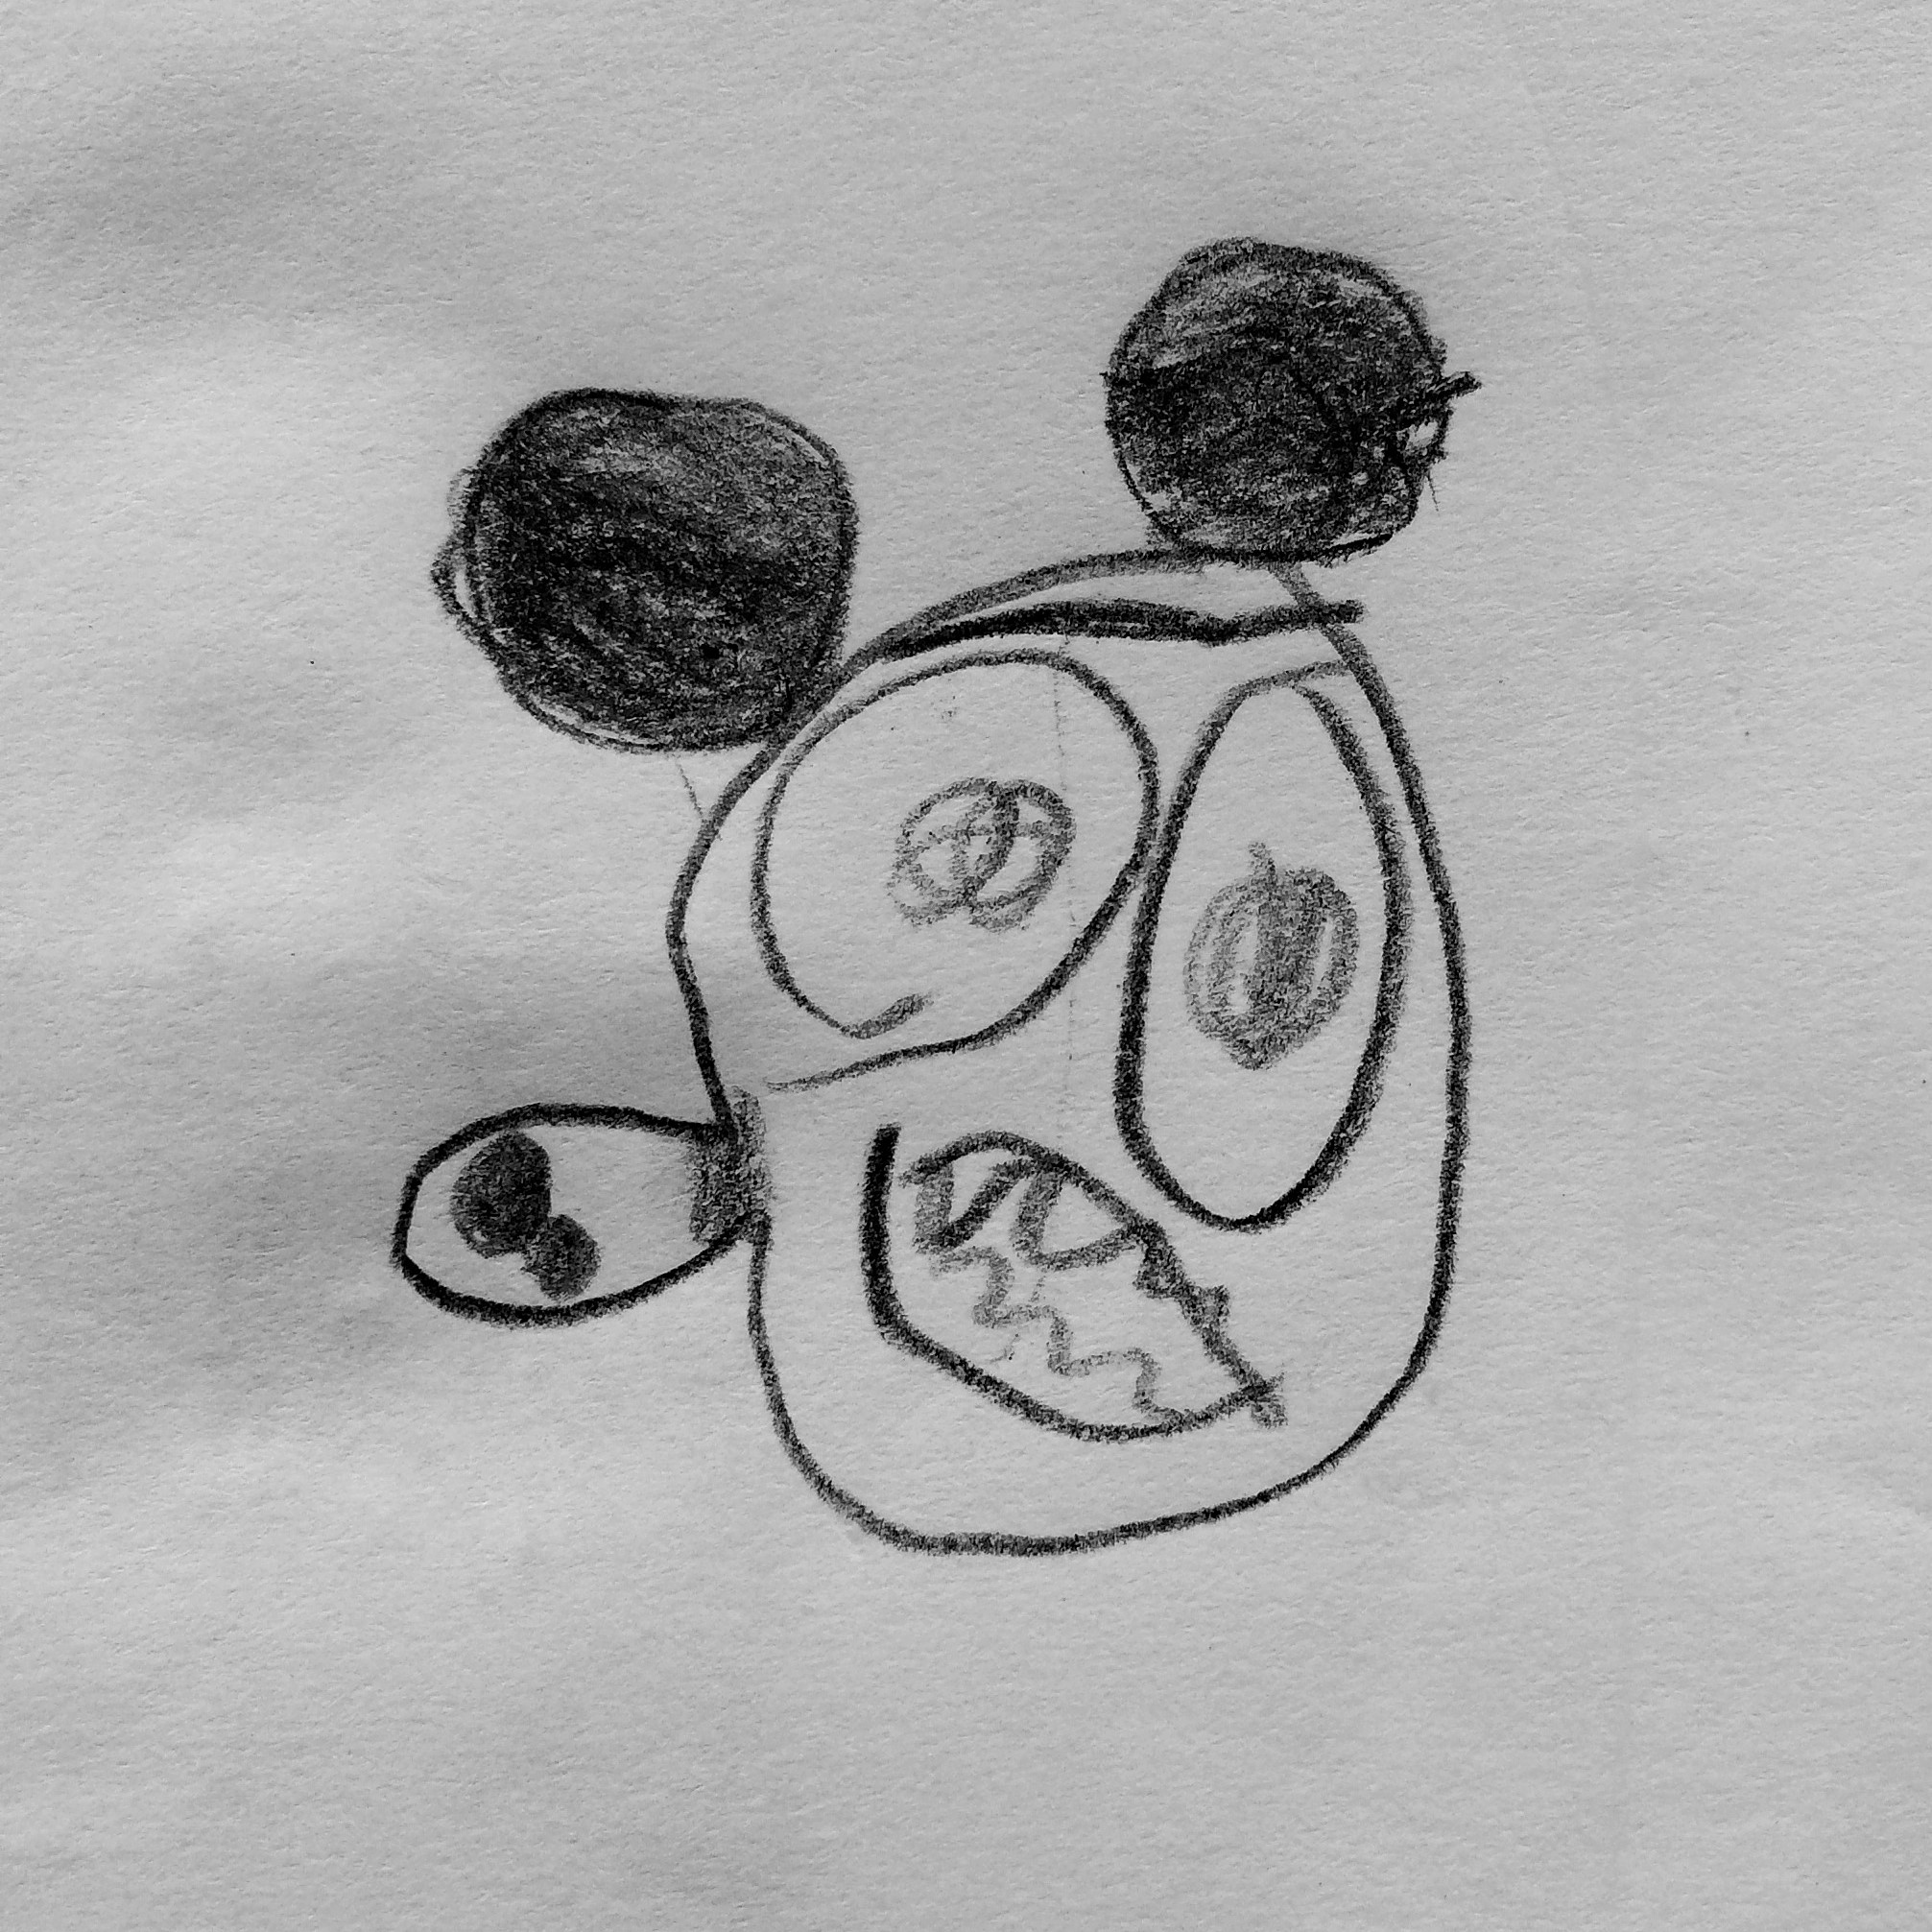 Copiar De Faciles Para Colorear Animados Dibujos